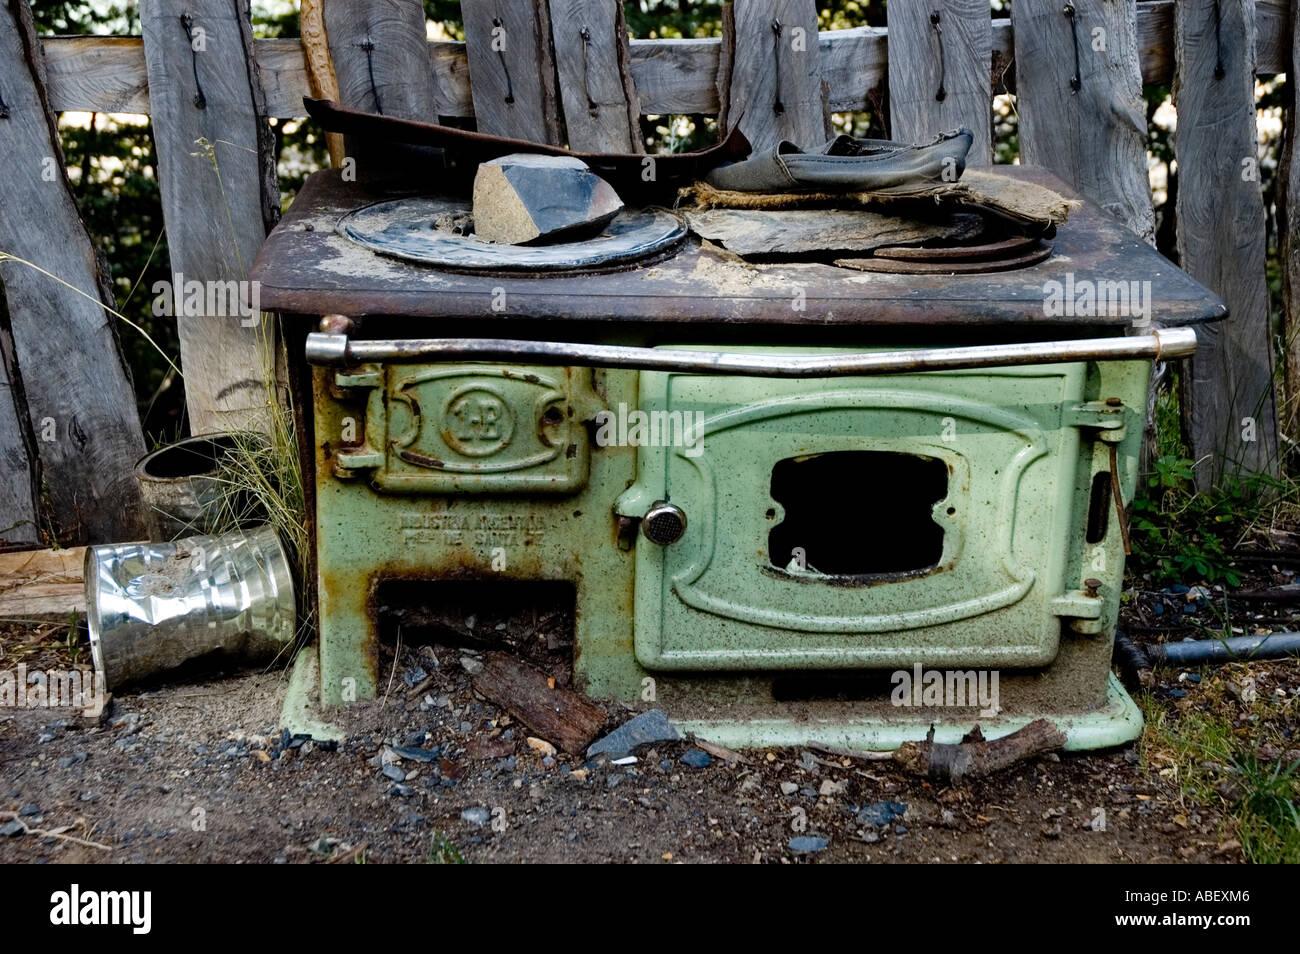 Old Stove in Refugio Los Troncos, Private Campsite near Piedra del Fraile, Santa Cruz, Patagonia, Argentina - Stock Image